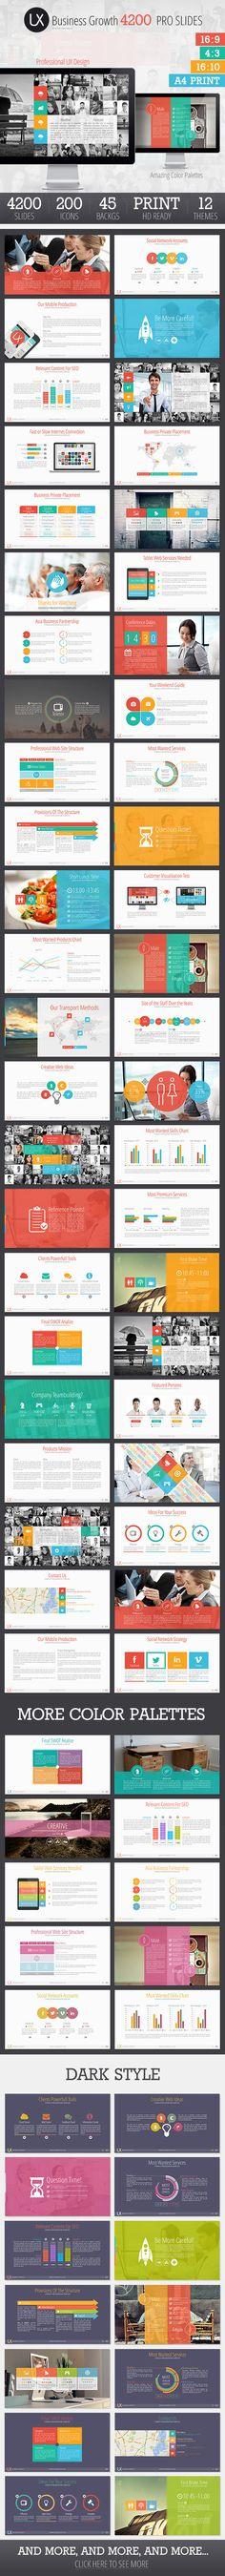 Material Keynote Presentation Template Presentation templates - sales presentation template